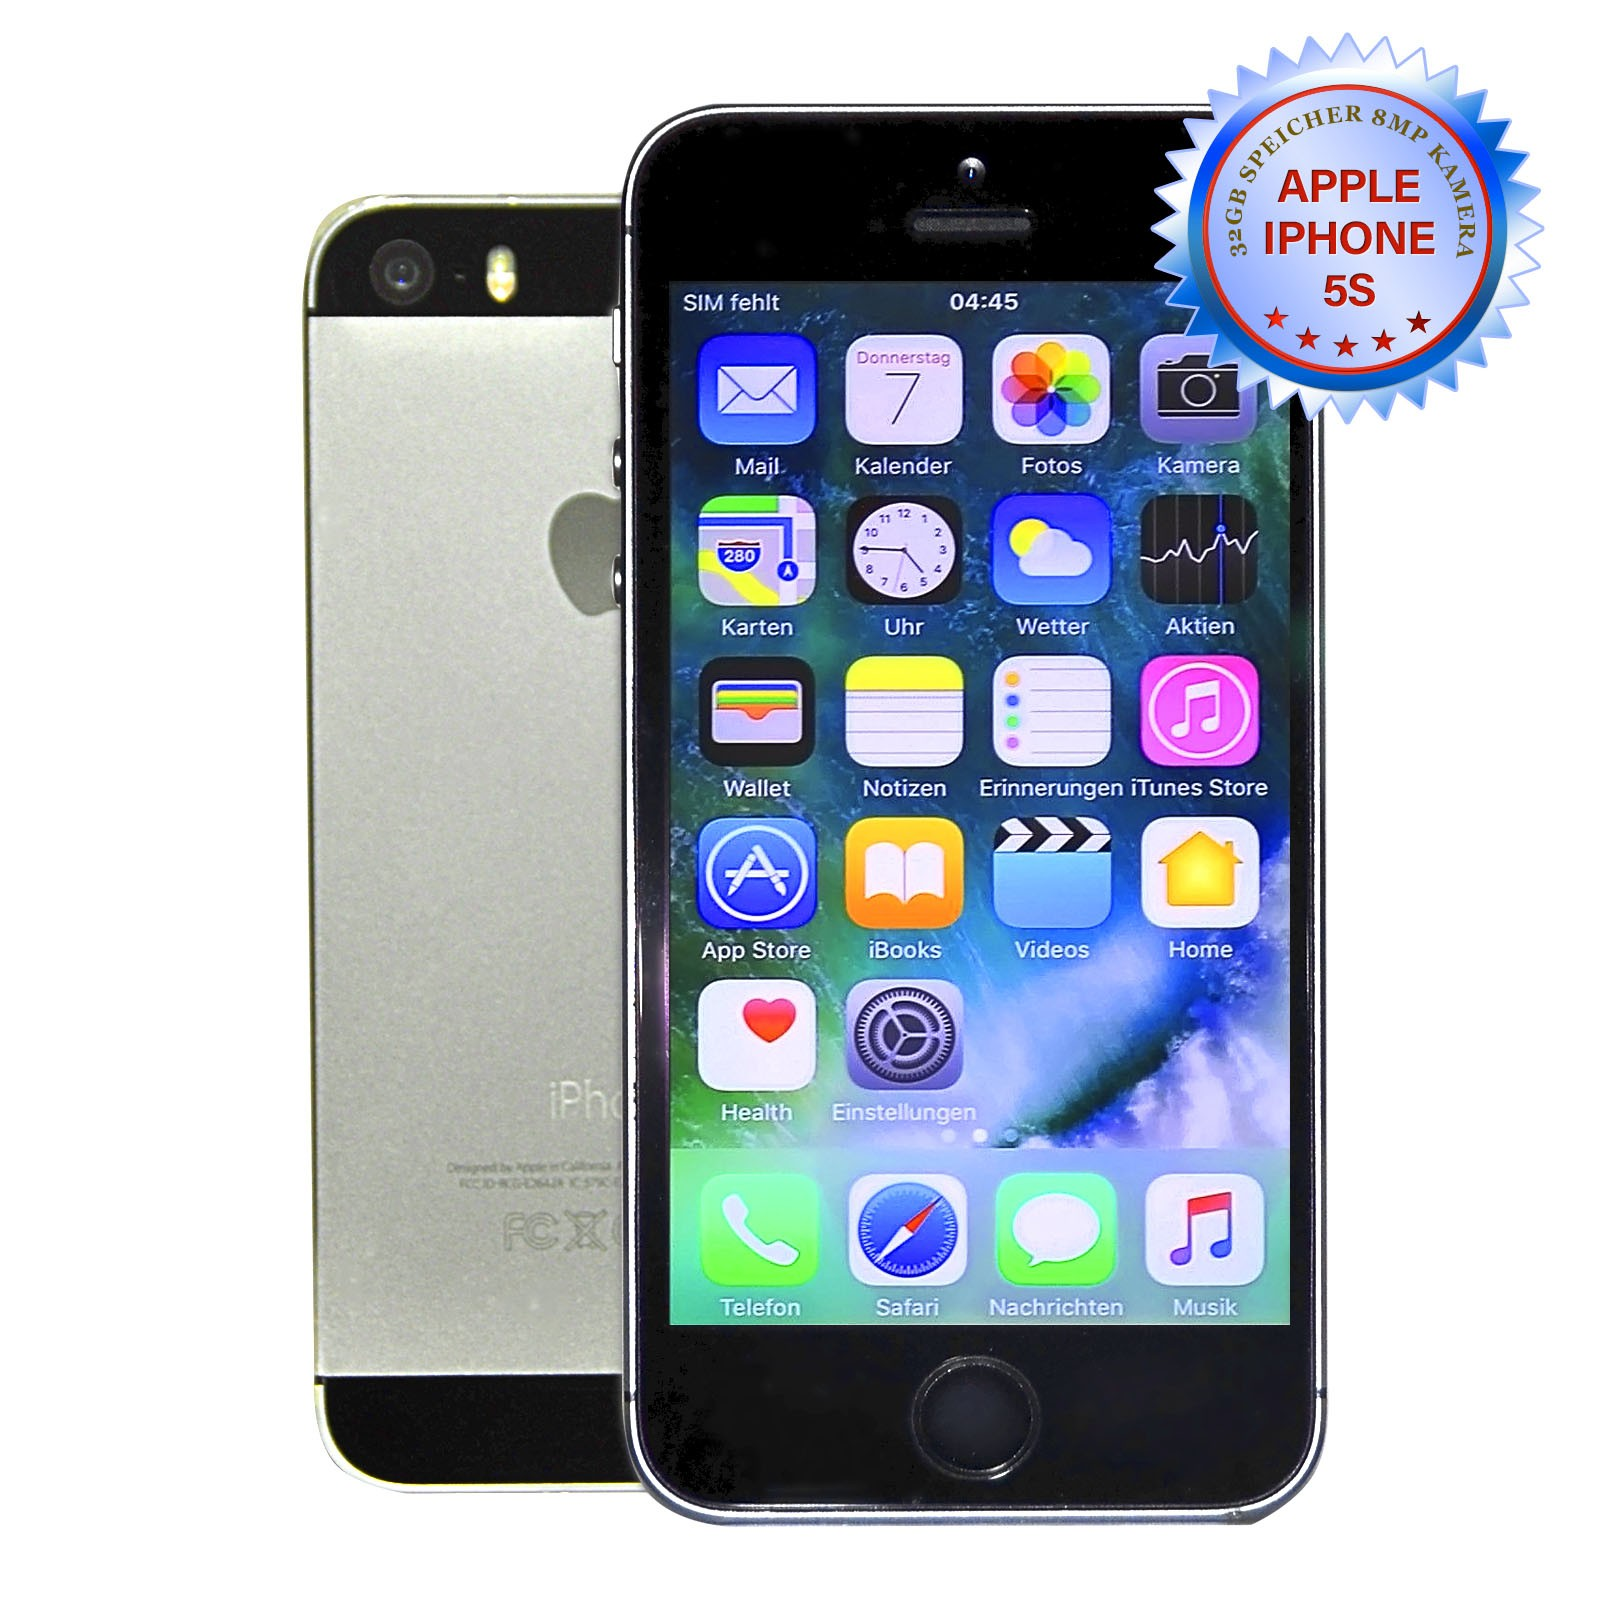 apple iphone 5s 32gb smartphone günstig